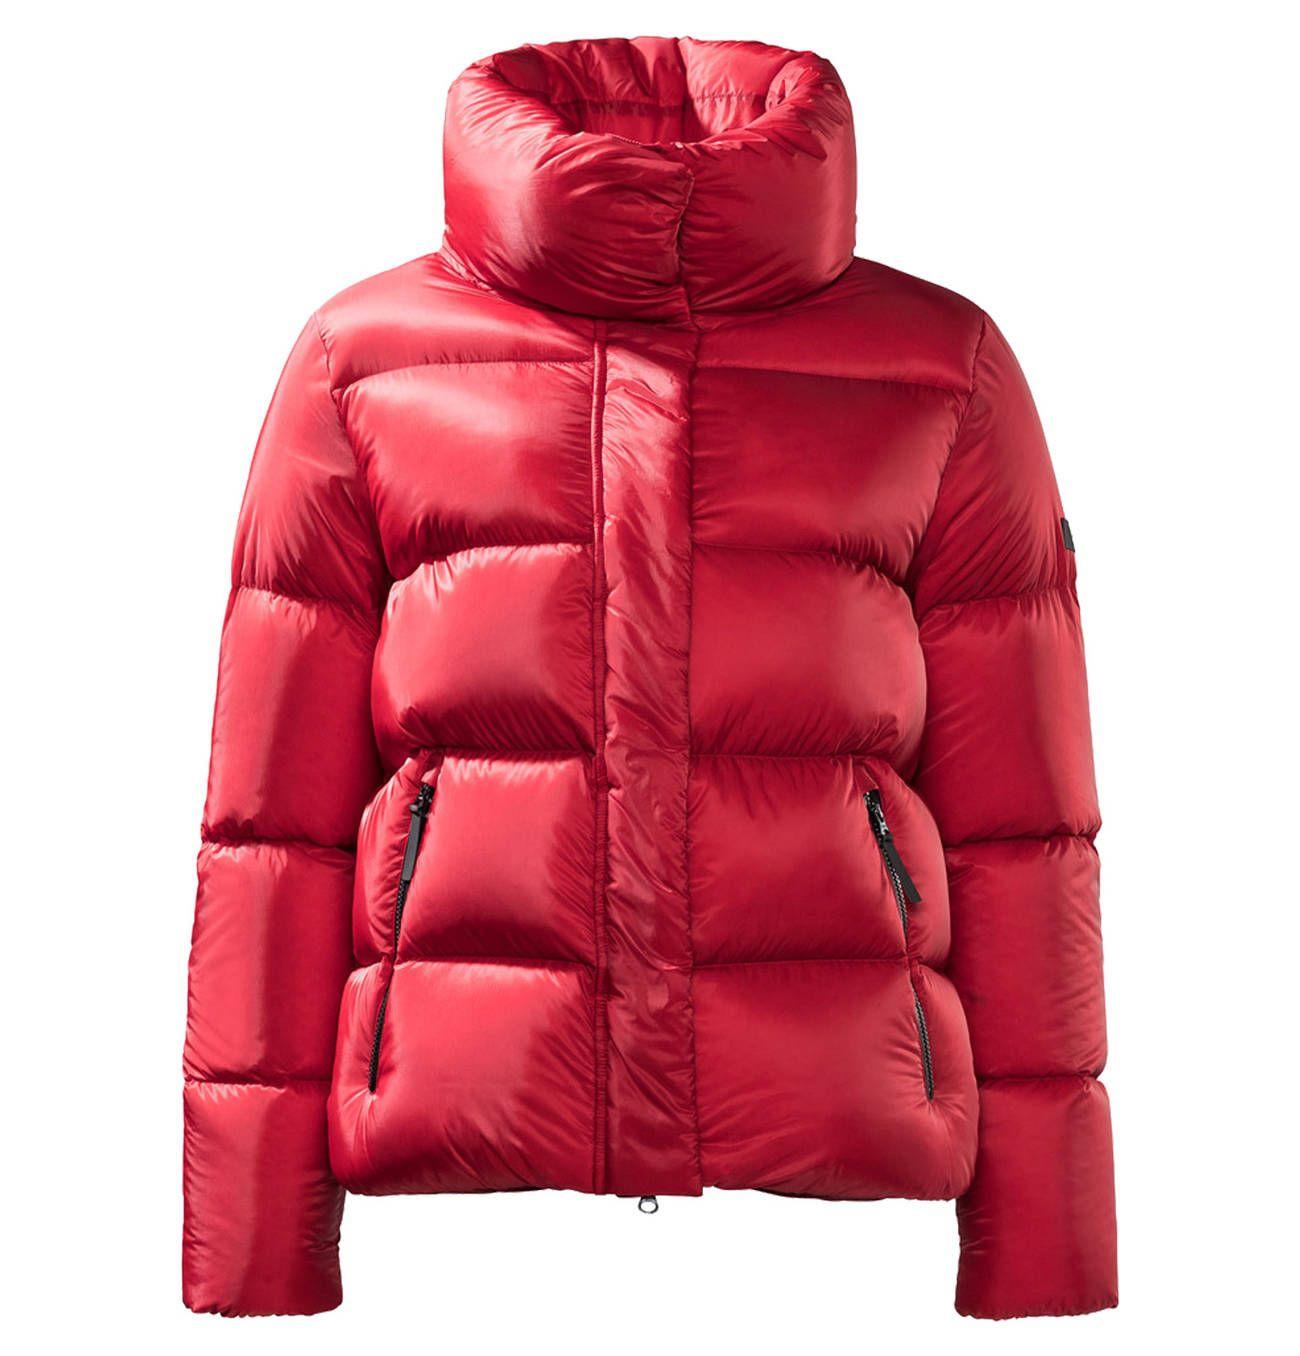 Patagonia Down With lt Jacket Damen Daunenjacke grün online